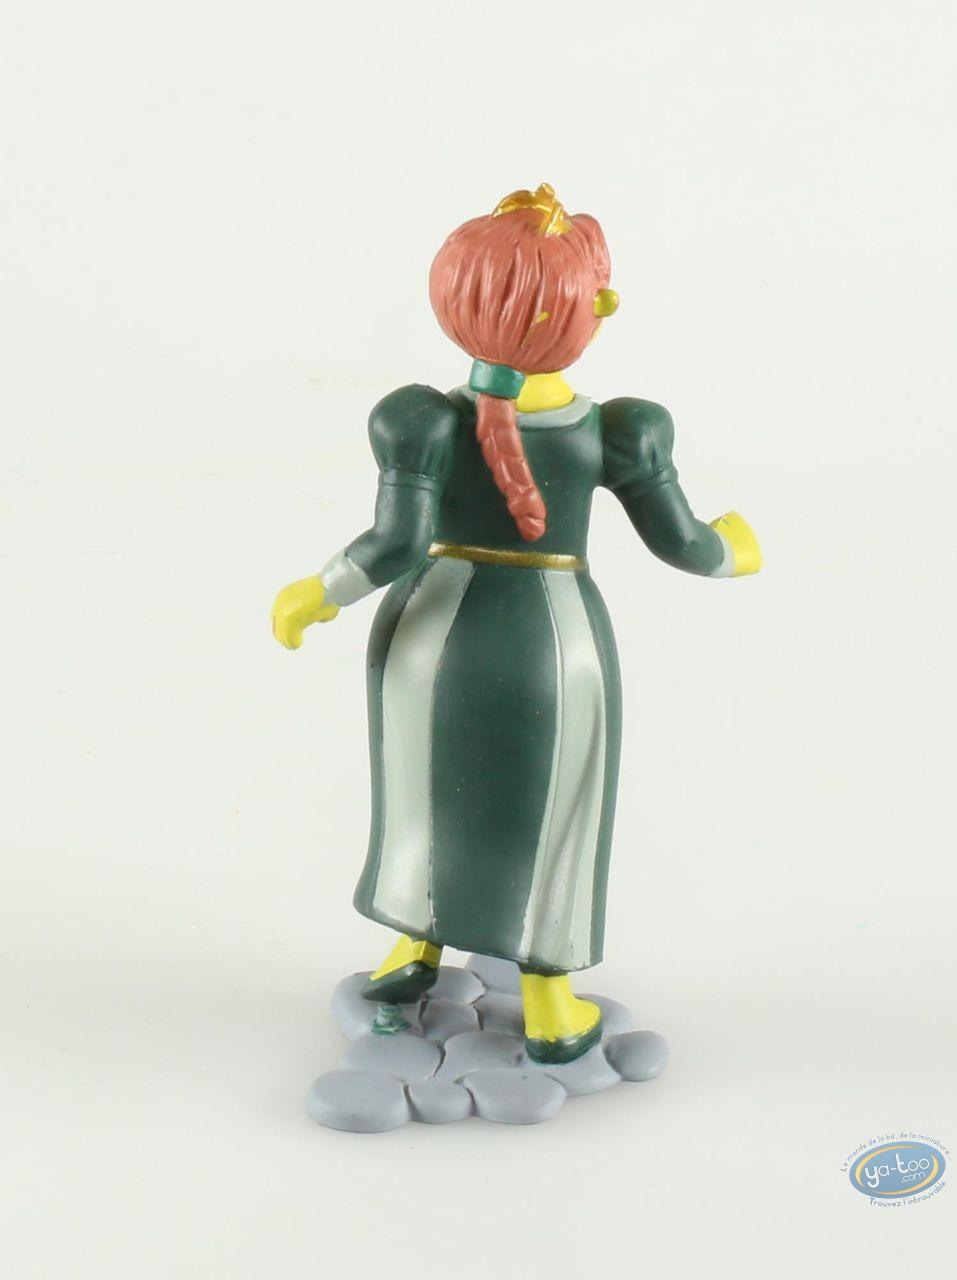 Figurine plastique, Shrek : Fiona marchant